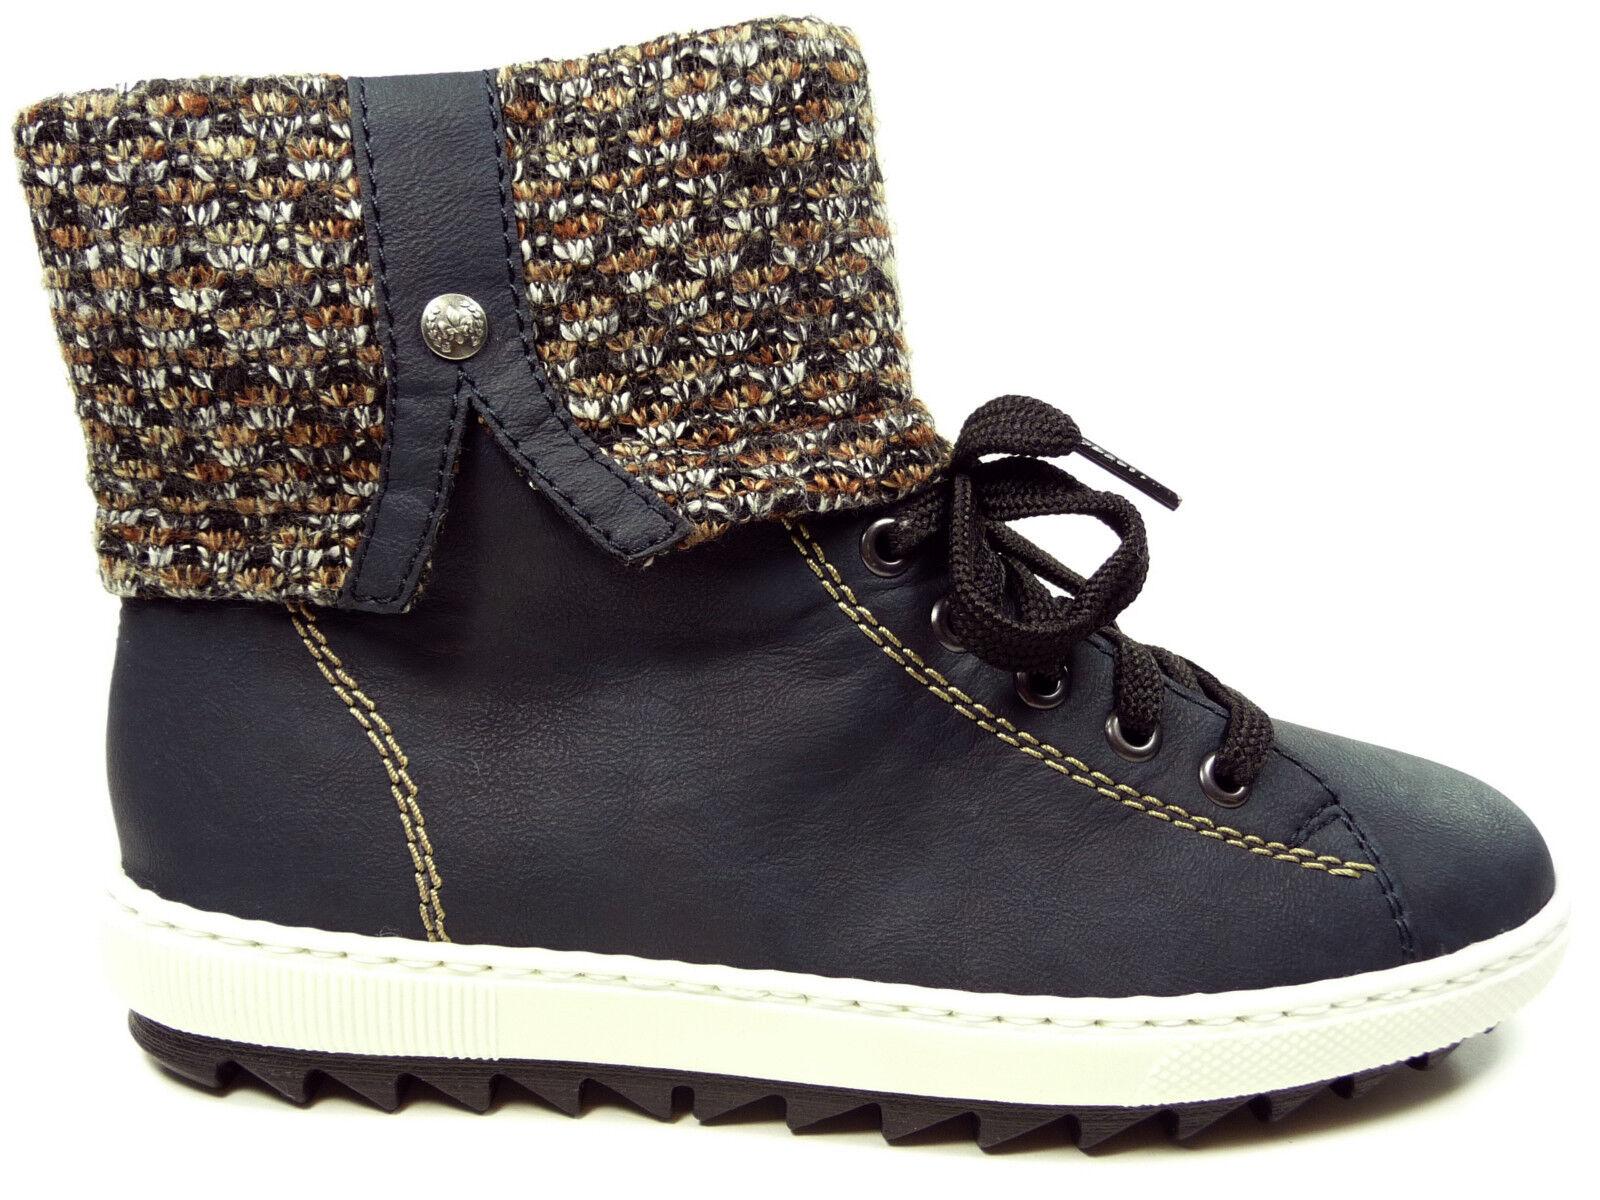 Rieker Damenschuhe Stiefelette Stiefel Stiefel Stiefel in Blau Y8443-14 86ecbe